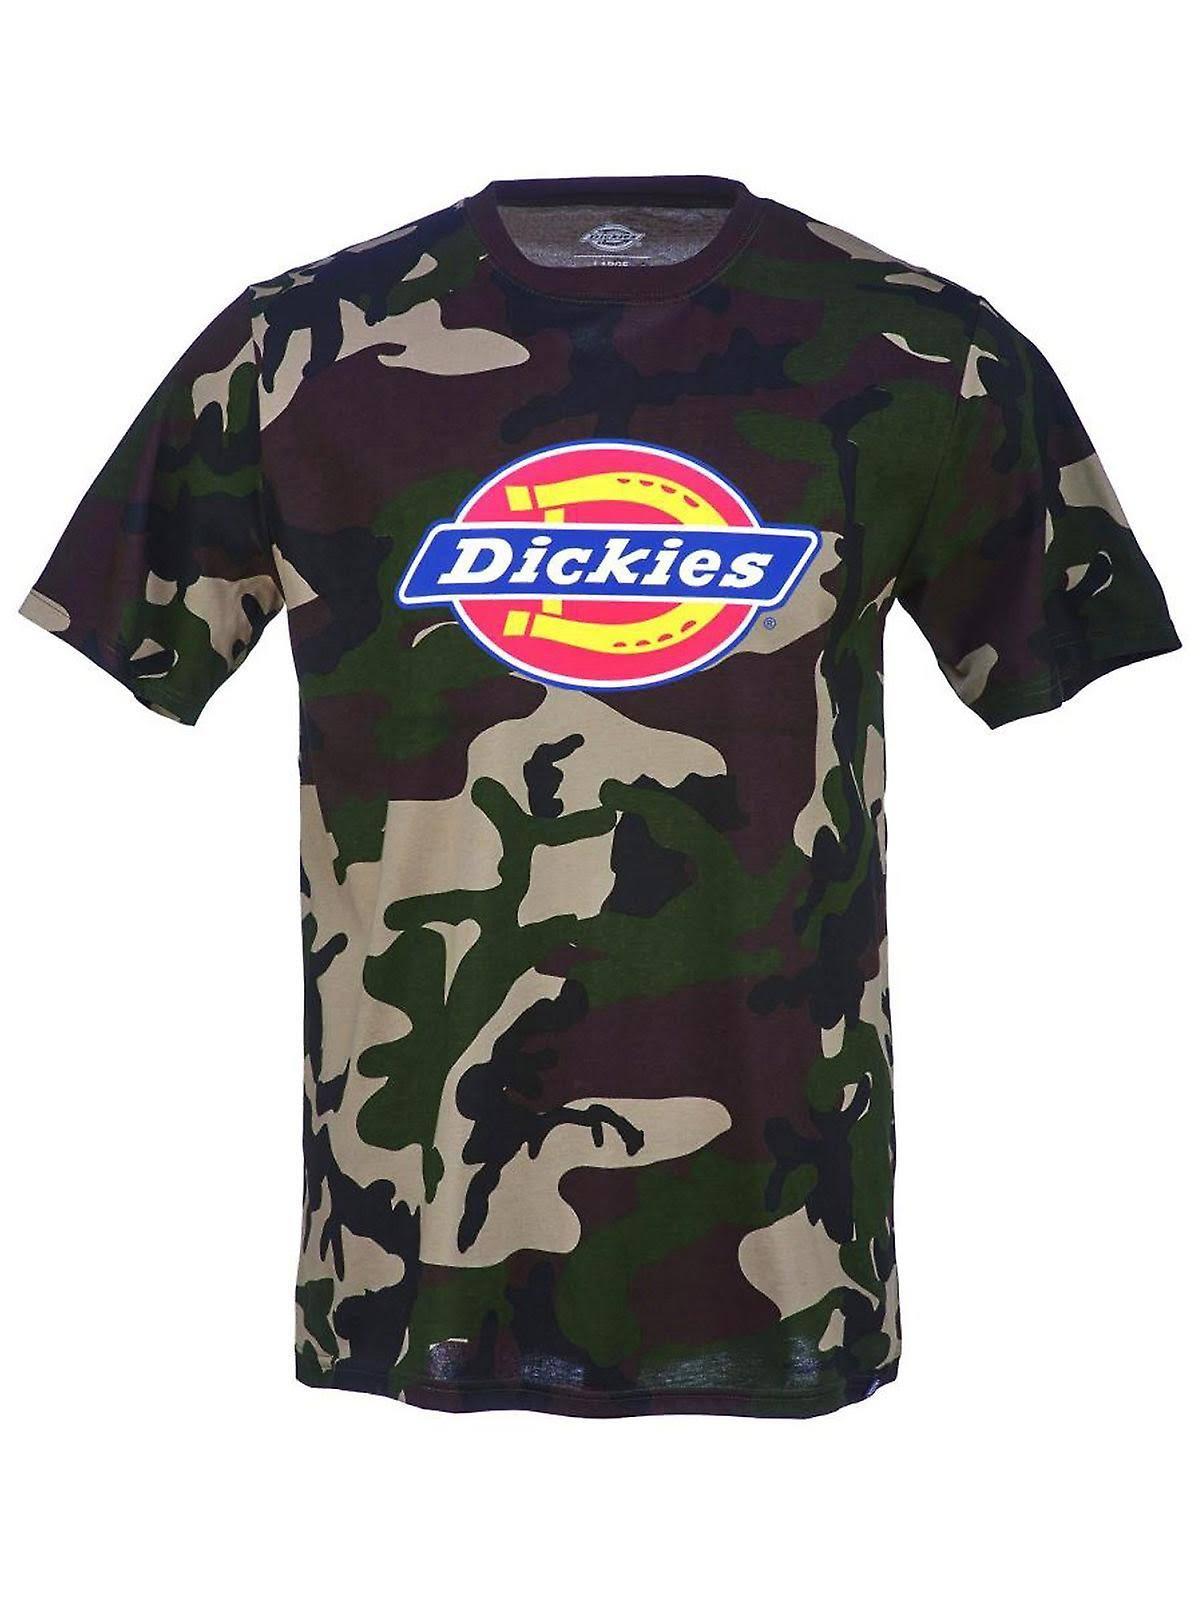 L Dickies L Multicolorido Multicolorido Multicolorido Dickies Camiseta Horseshoe Camiseta Horseshoe Camiseta Horseshoe Dickies fHwqx1T5Bq